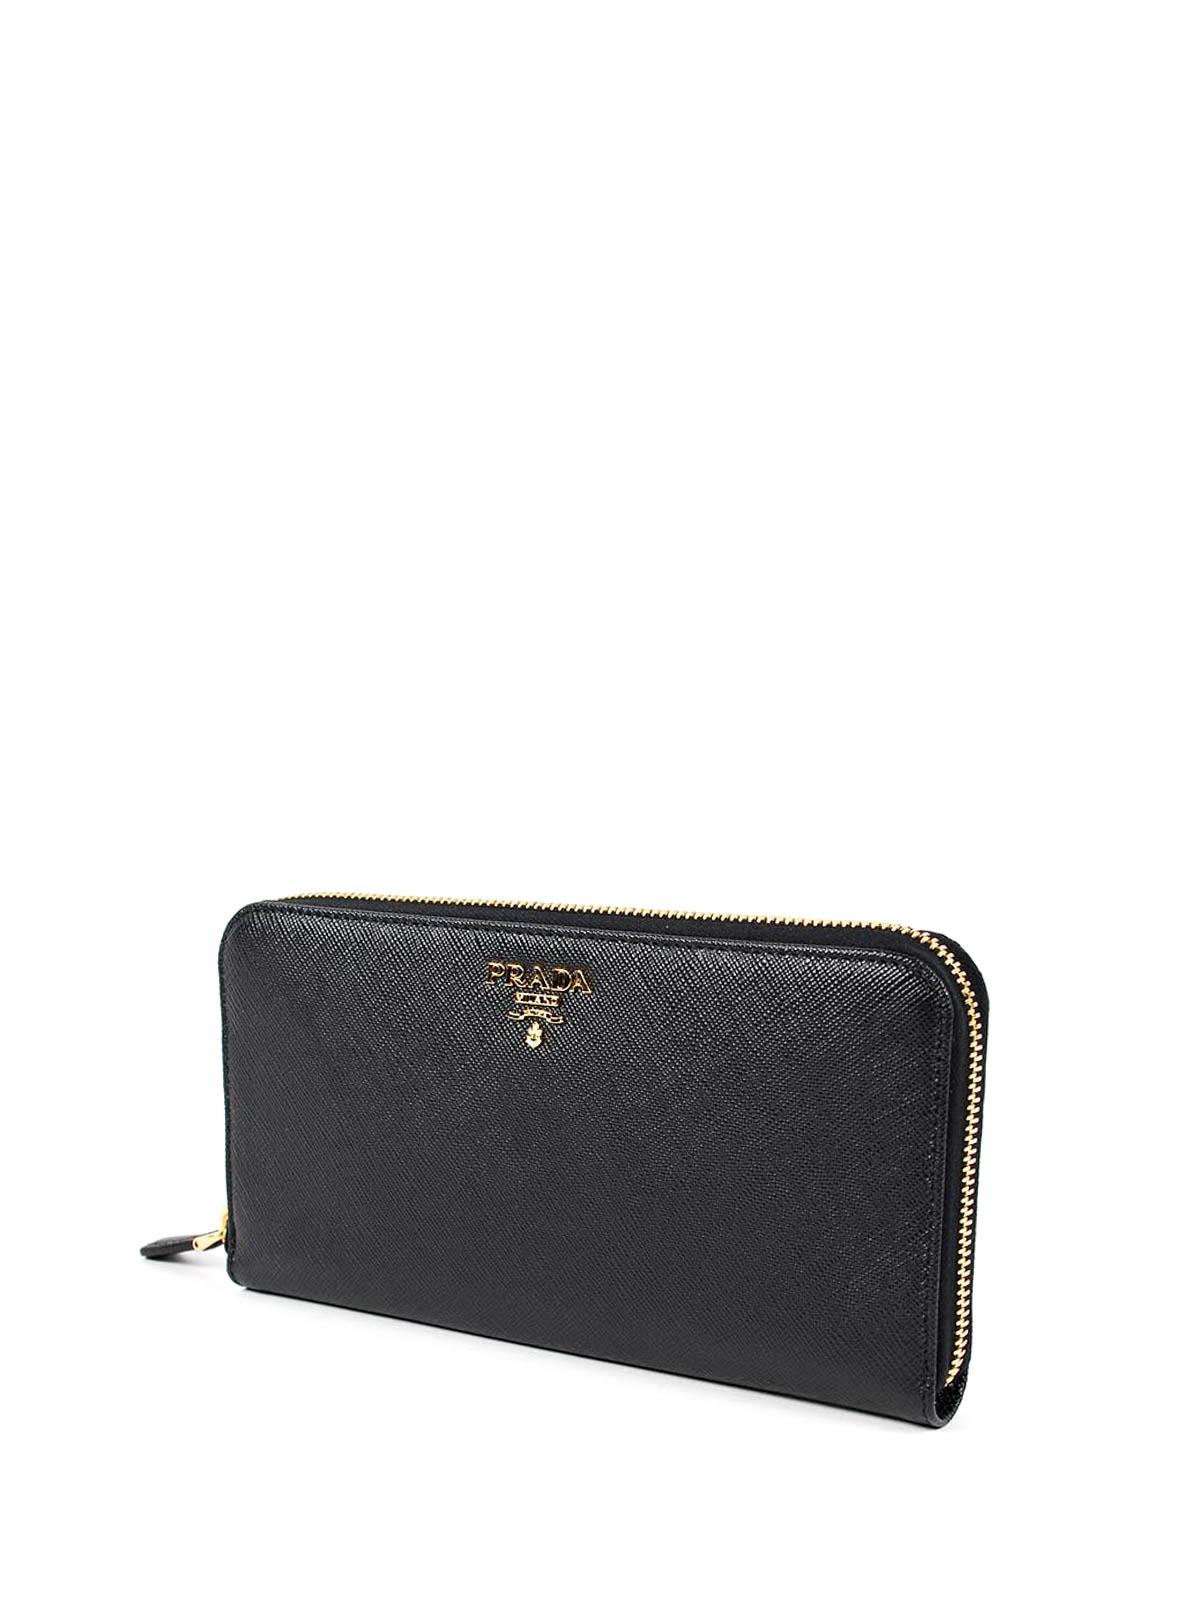 4ee43e859dc09d PRADA: wallets & purses online - Saffiano leather zip around wallet